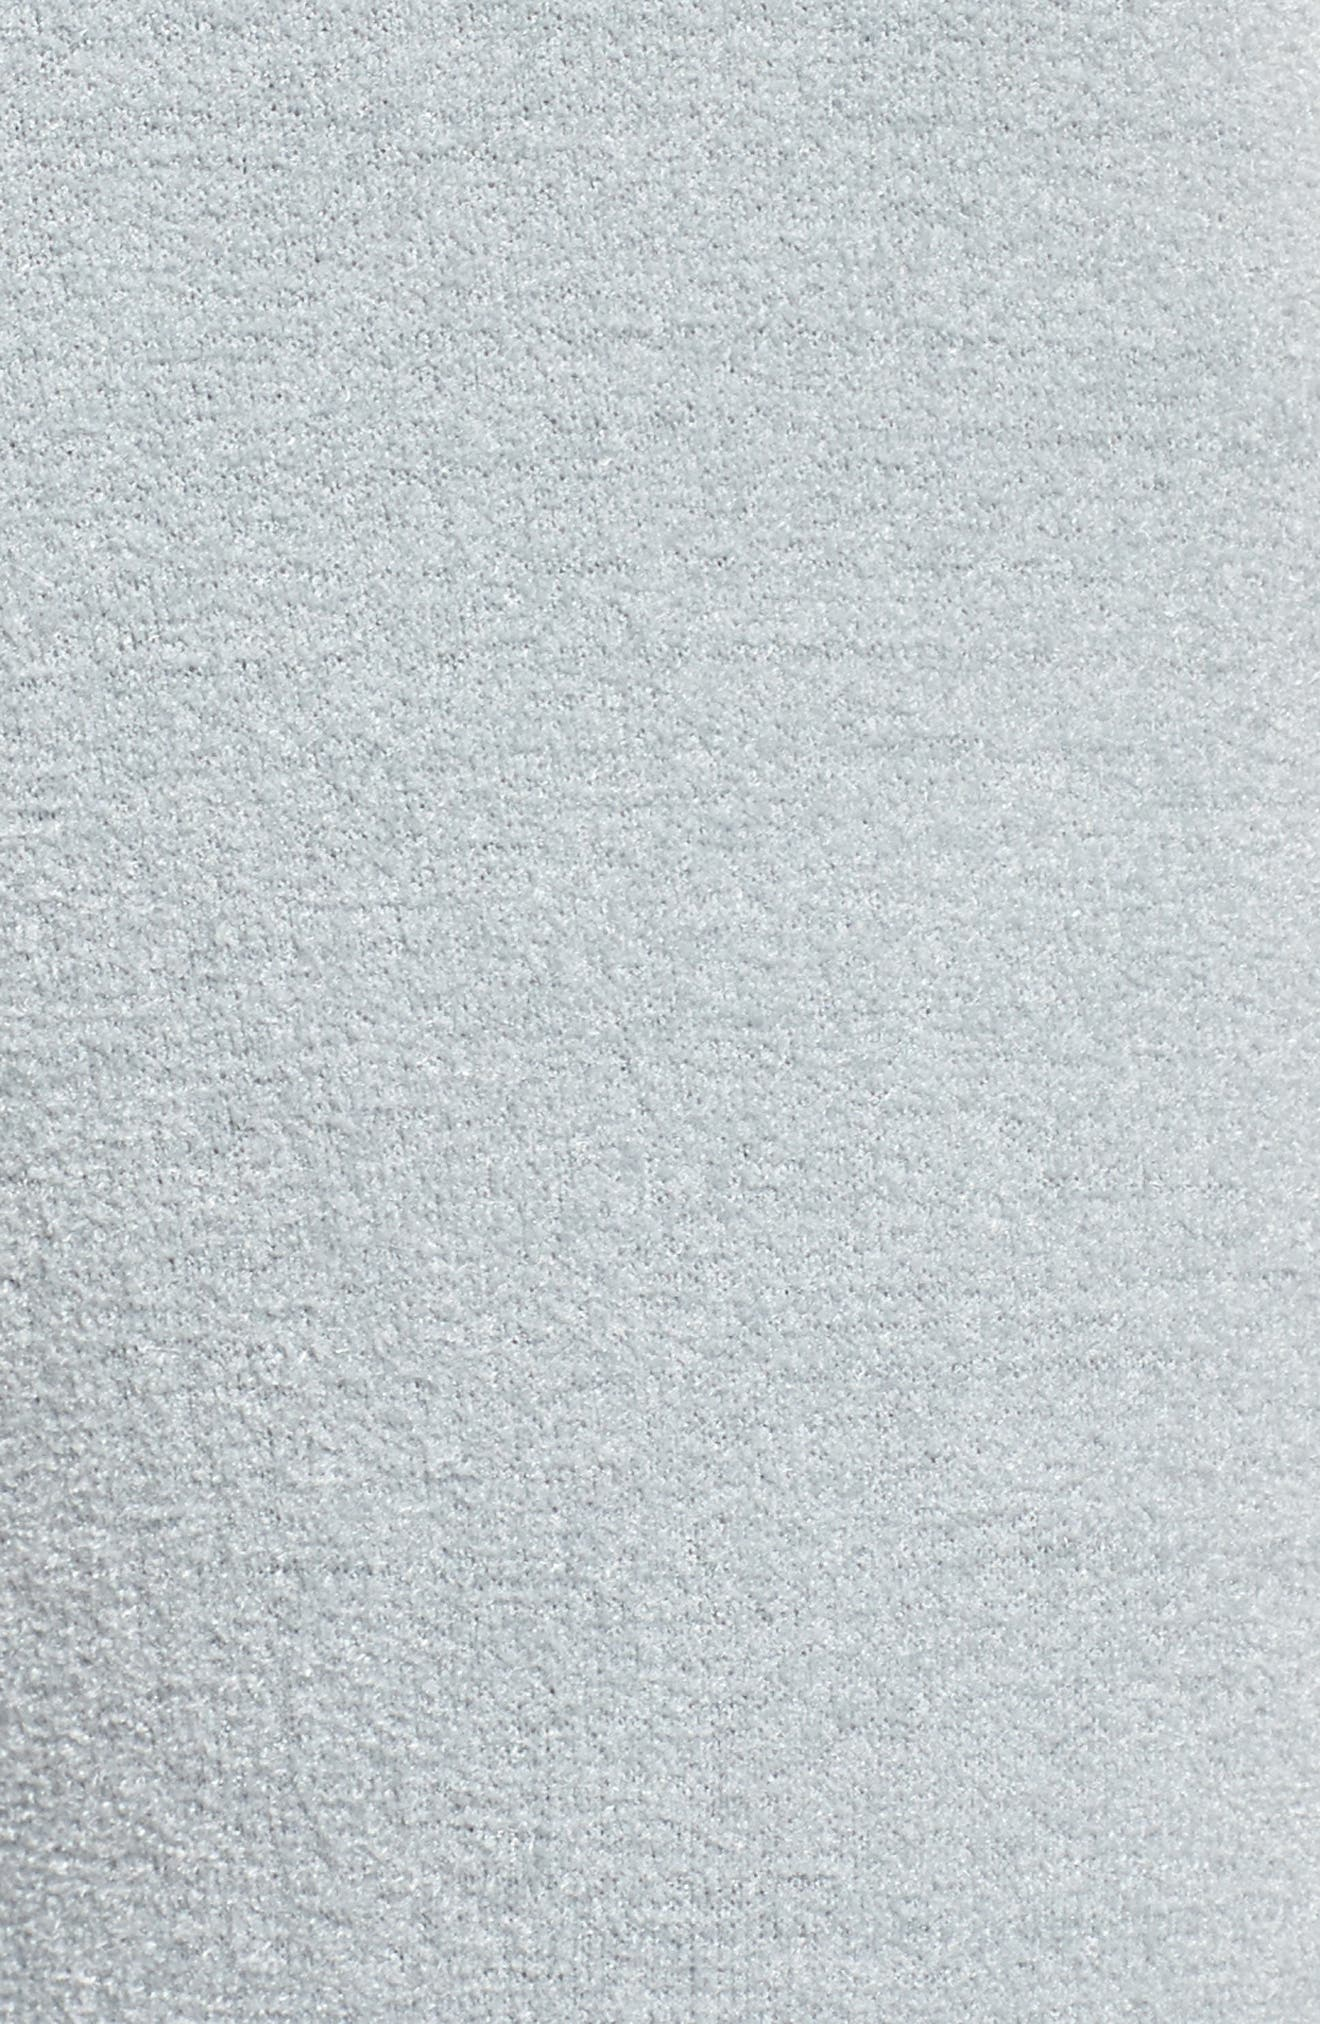 Cozychic Ultra Lite<sup>®</sup> Culotte Lounge Pants,                             Alternate thumbnail 7, color,                             Blue Water